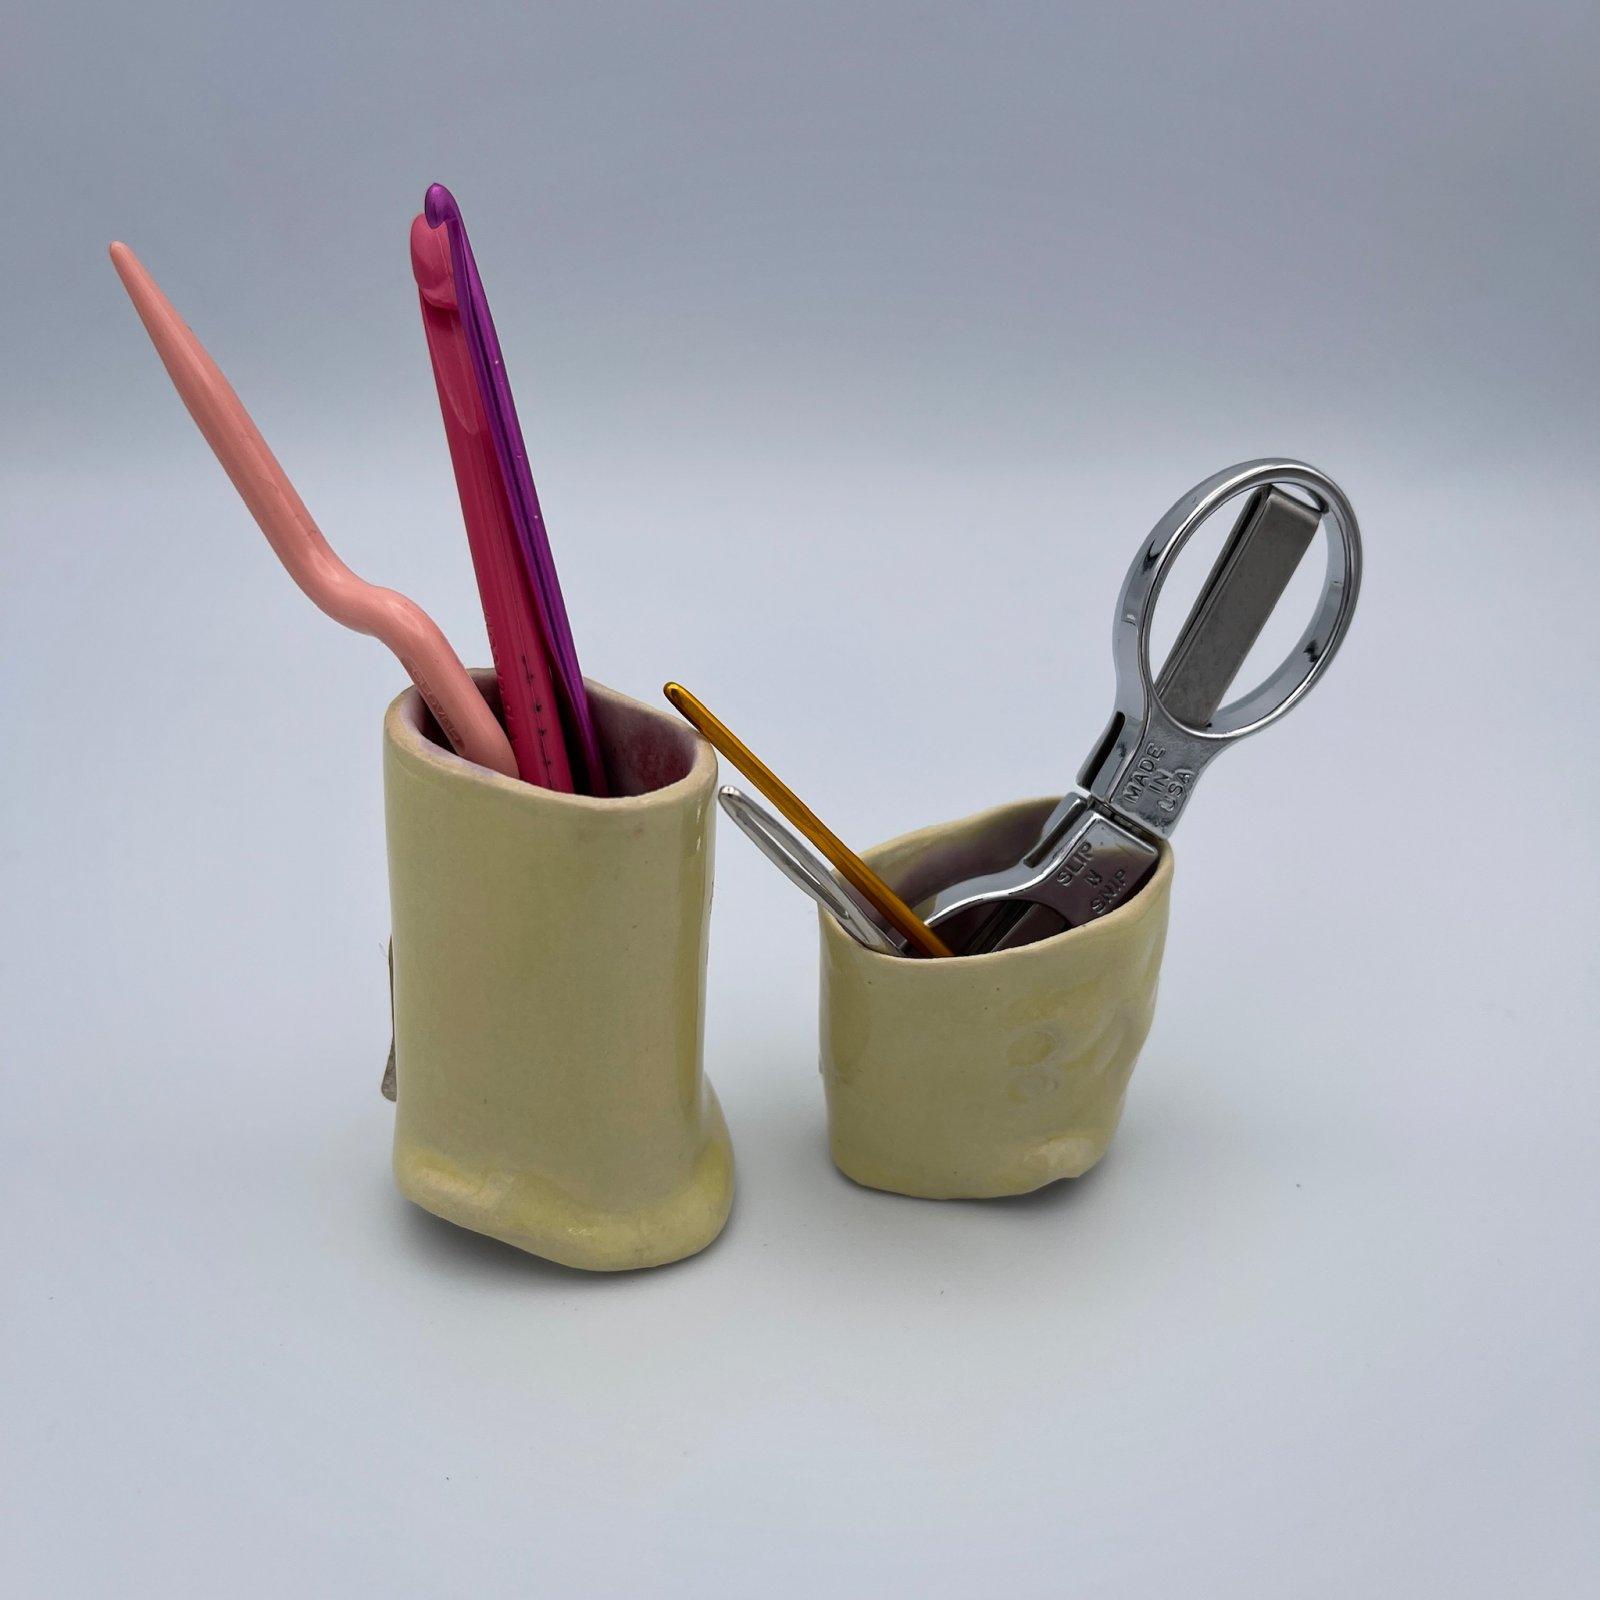 Yarn Pottery - Dandelion Pot - Amy Fox Designs